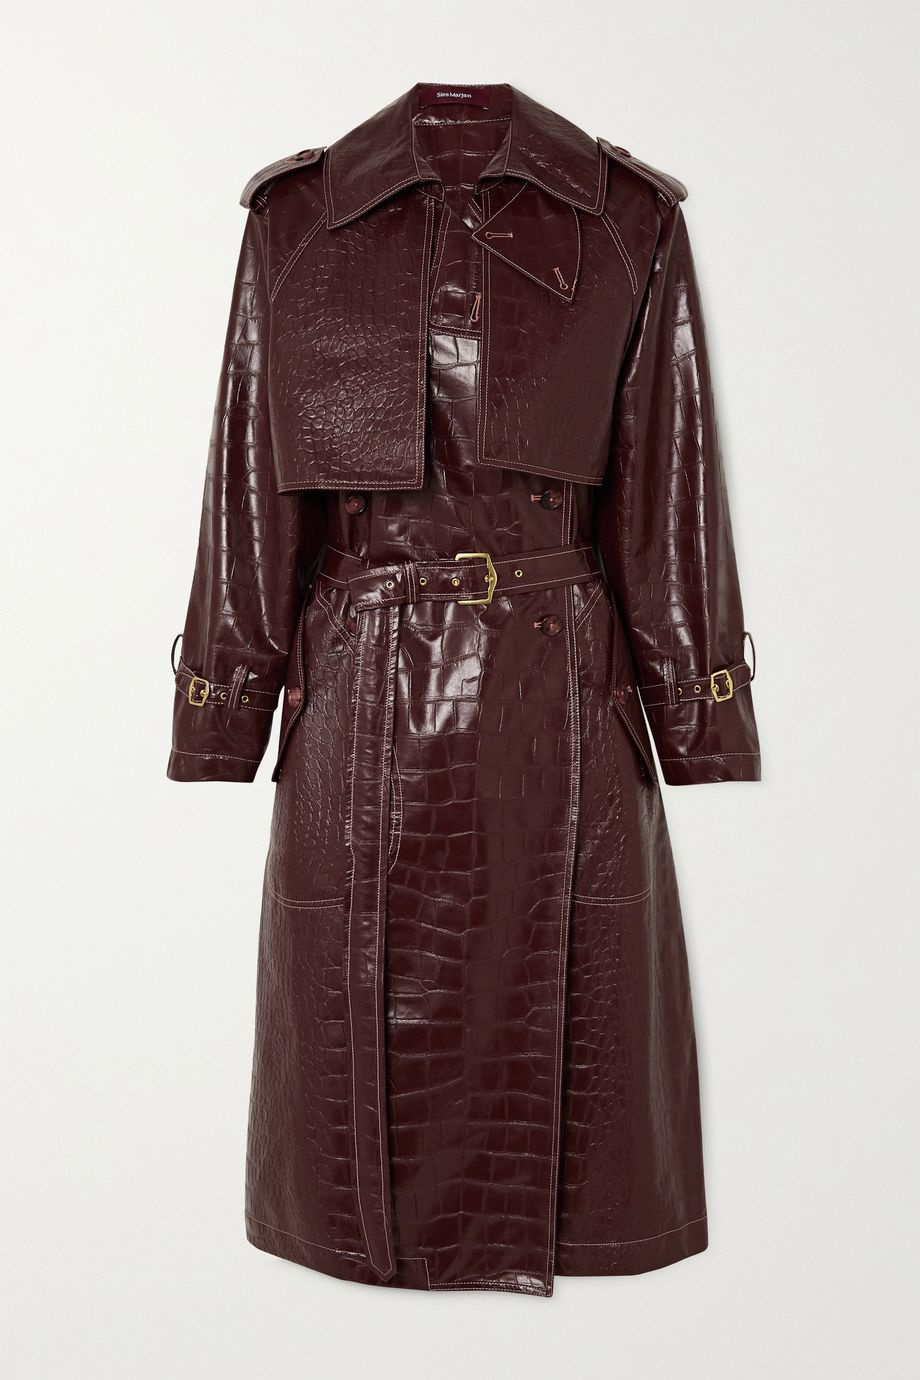 Sies Marjan Eva croc-effect faux leather trench coat